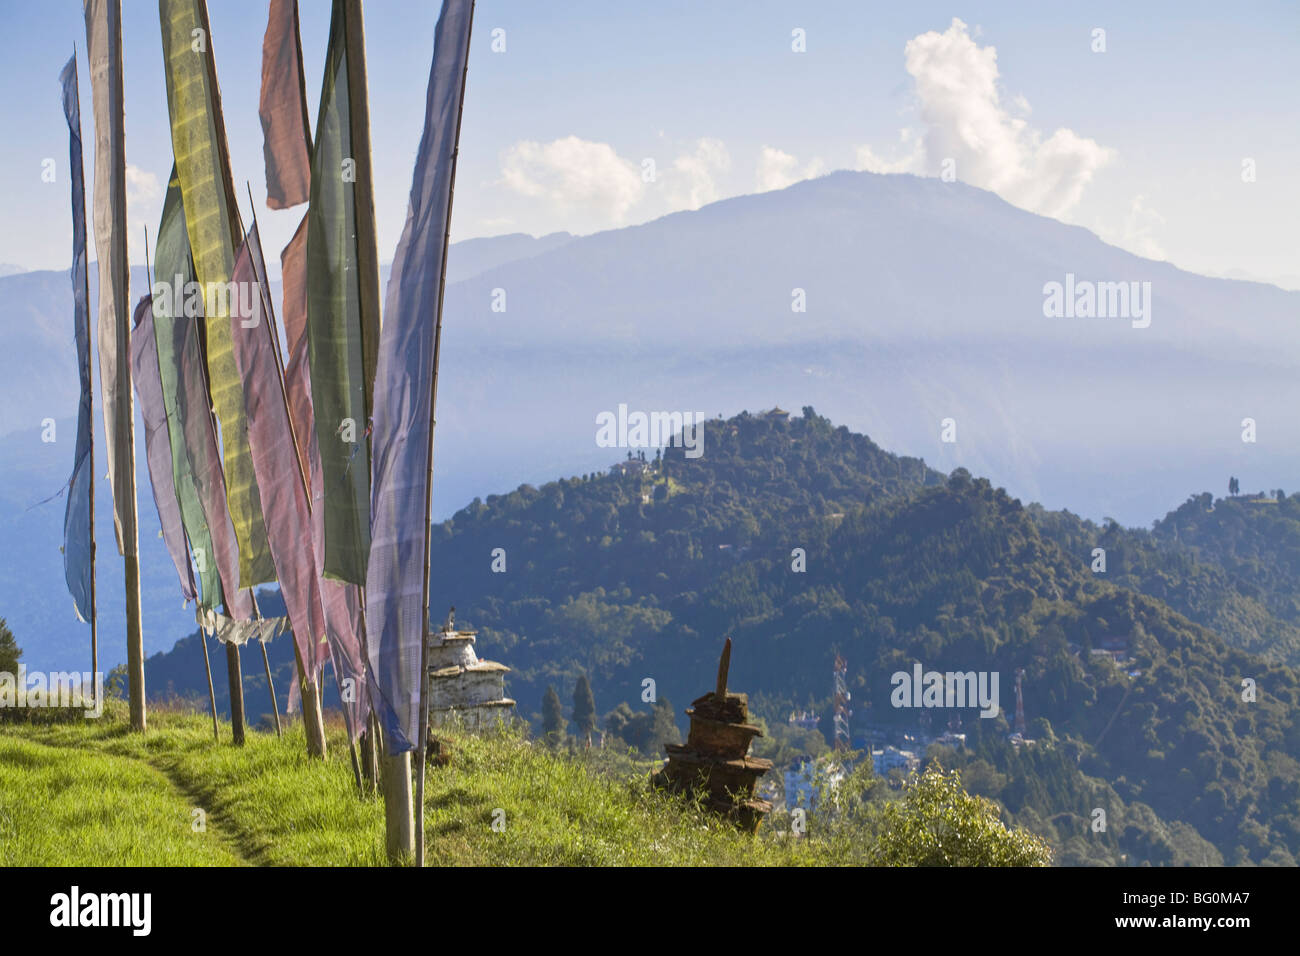 Sangachoeling Gompa Gompa, el segundo más antiguo de Sikkim, Pelling, Sikkim, India, Asia Imagen De Stock